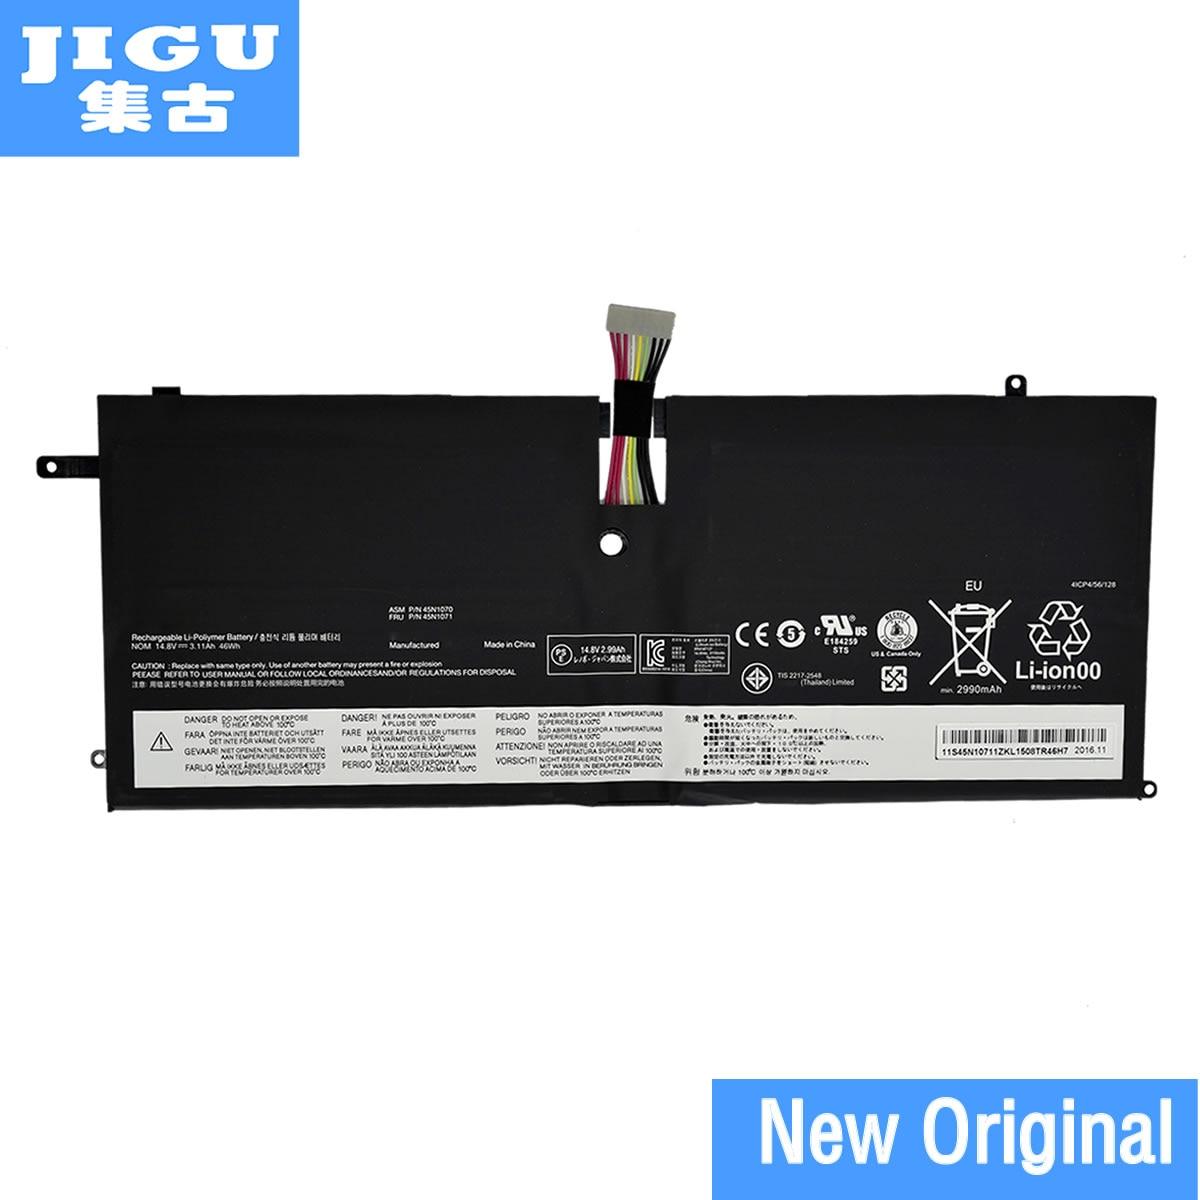 JIGU 45N1070 45N1071 4ICP4/51/95 Original Laptop Battery For Lenovo For ThinkPad New X1 Carbon X1C 14.8V 46WH jigu 45n1070 45n1071 4icp4 51 95 original laptop battery for lenovo thinkpad new x1 carbon x1c 14 8v 46wh